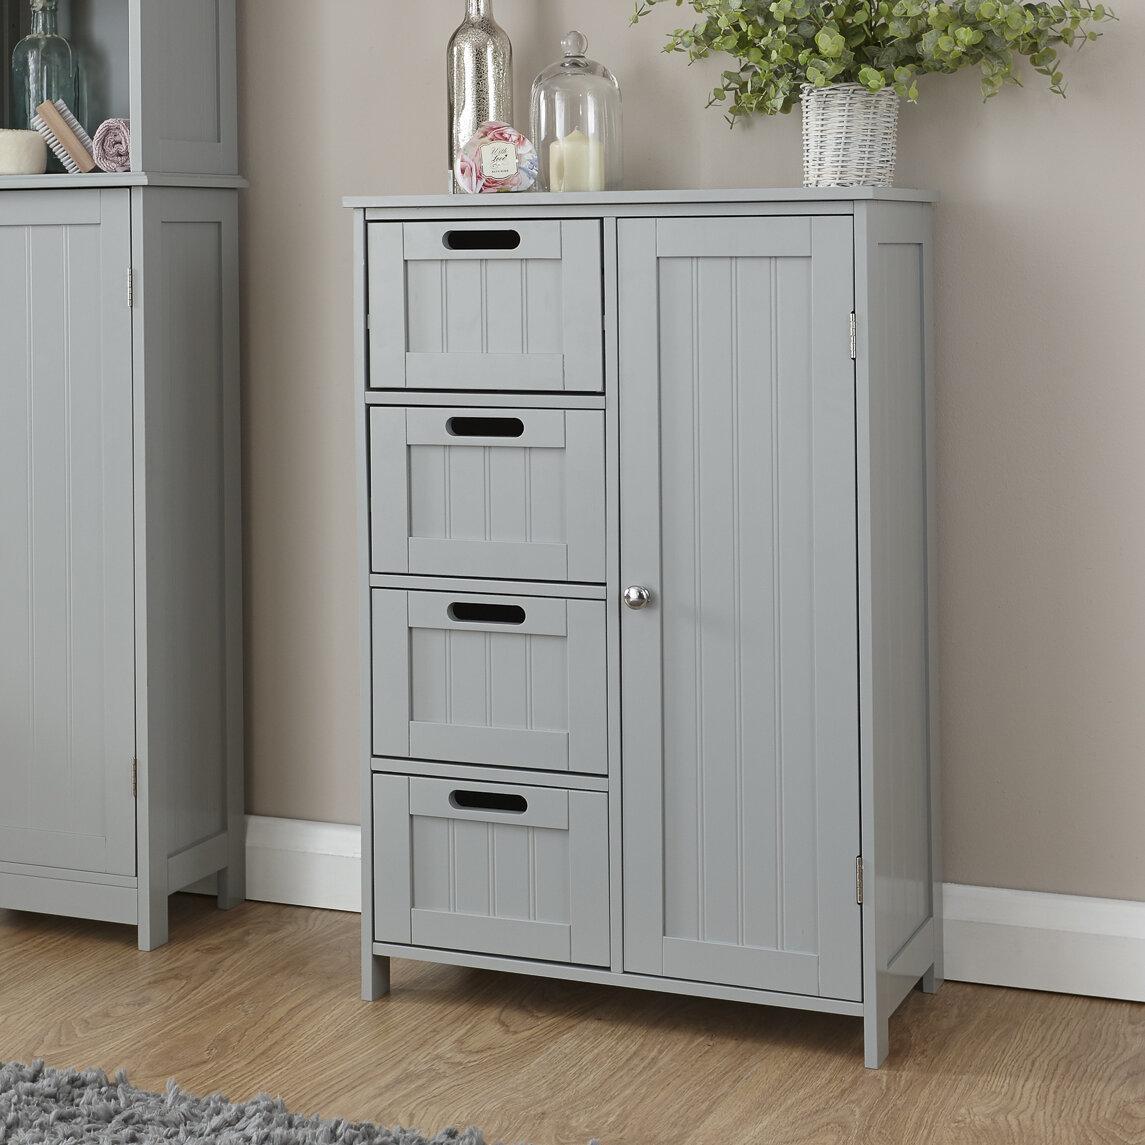 7cm x 7cm Free Standing Cabinet